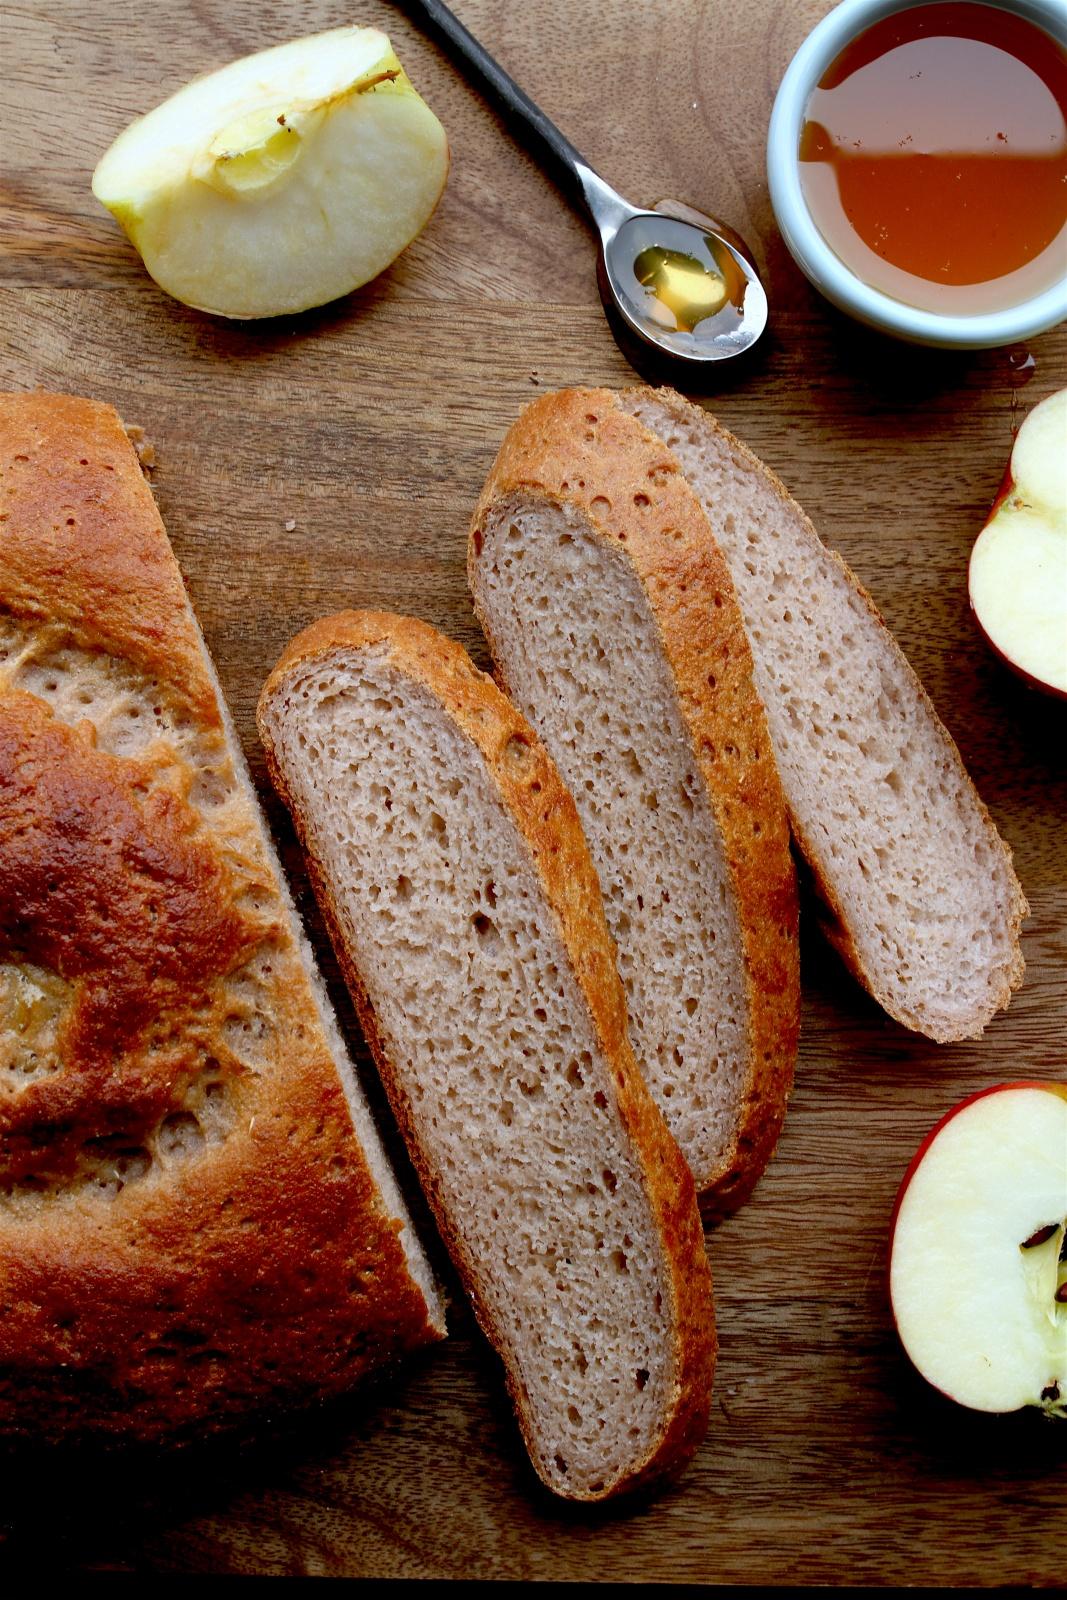 gluten-free challah